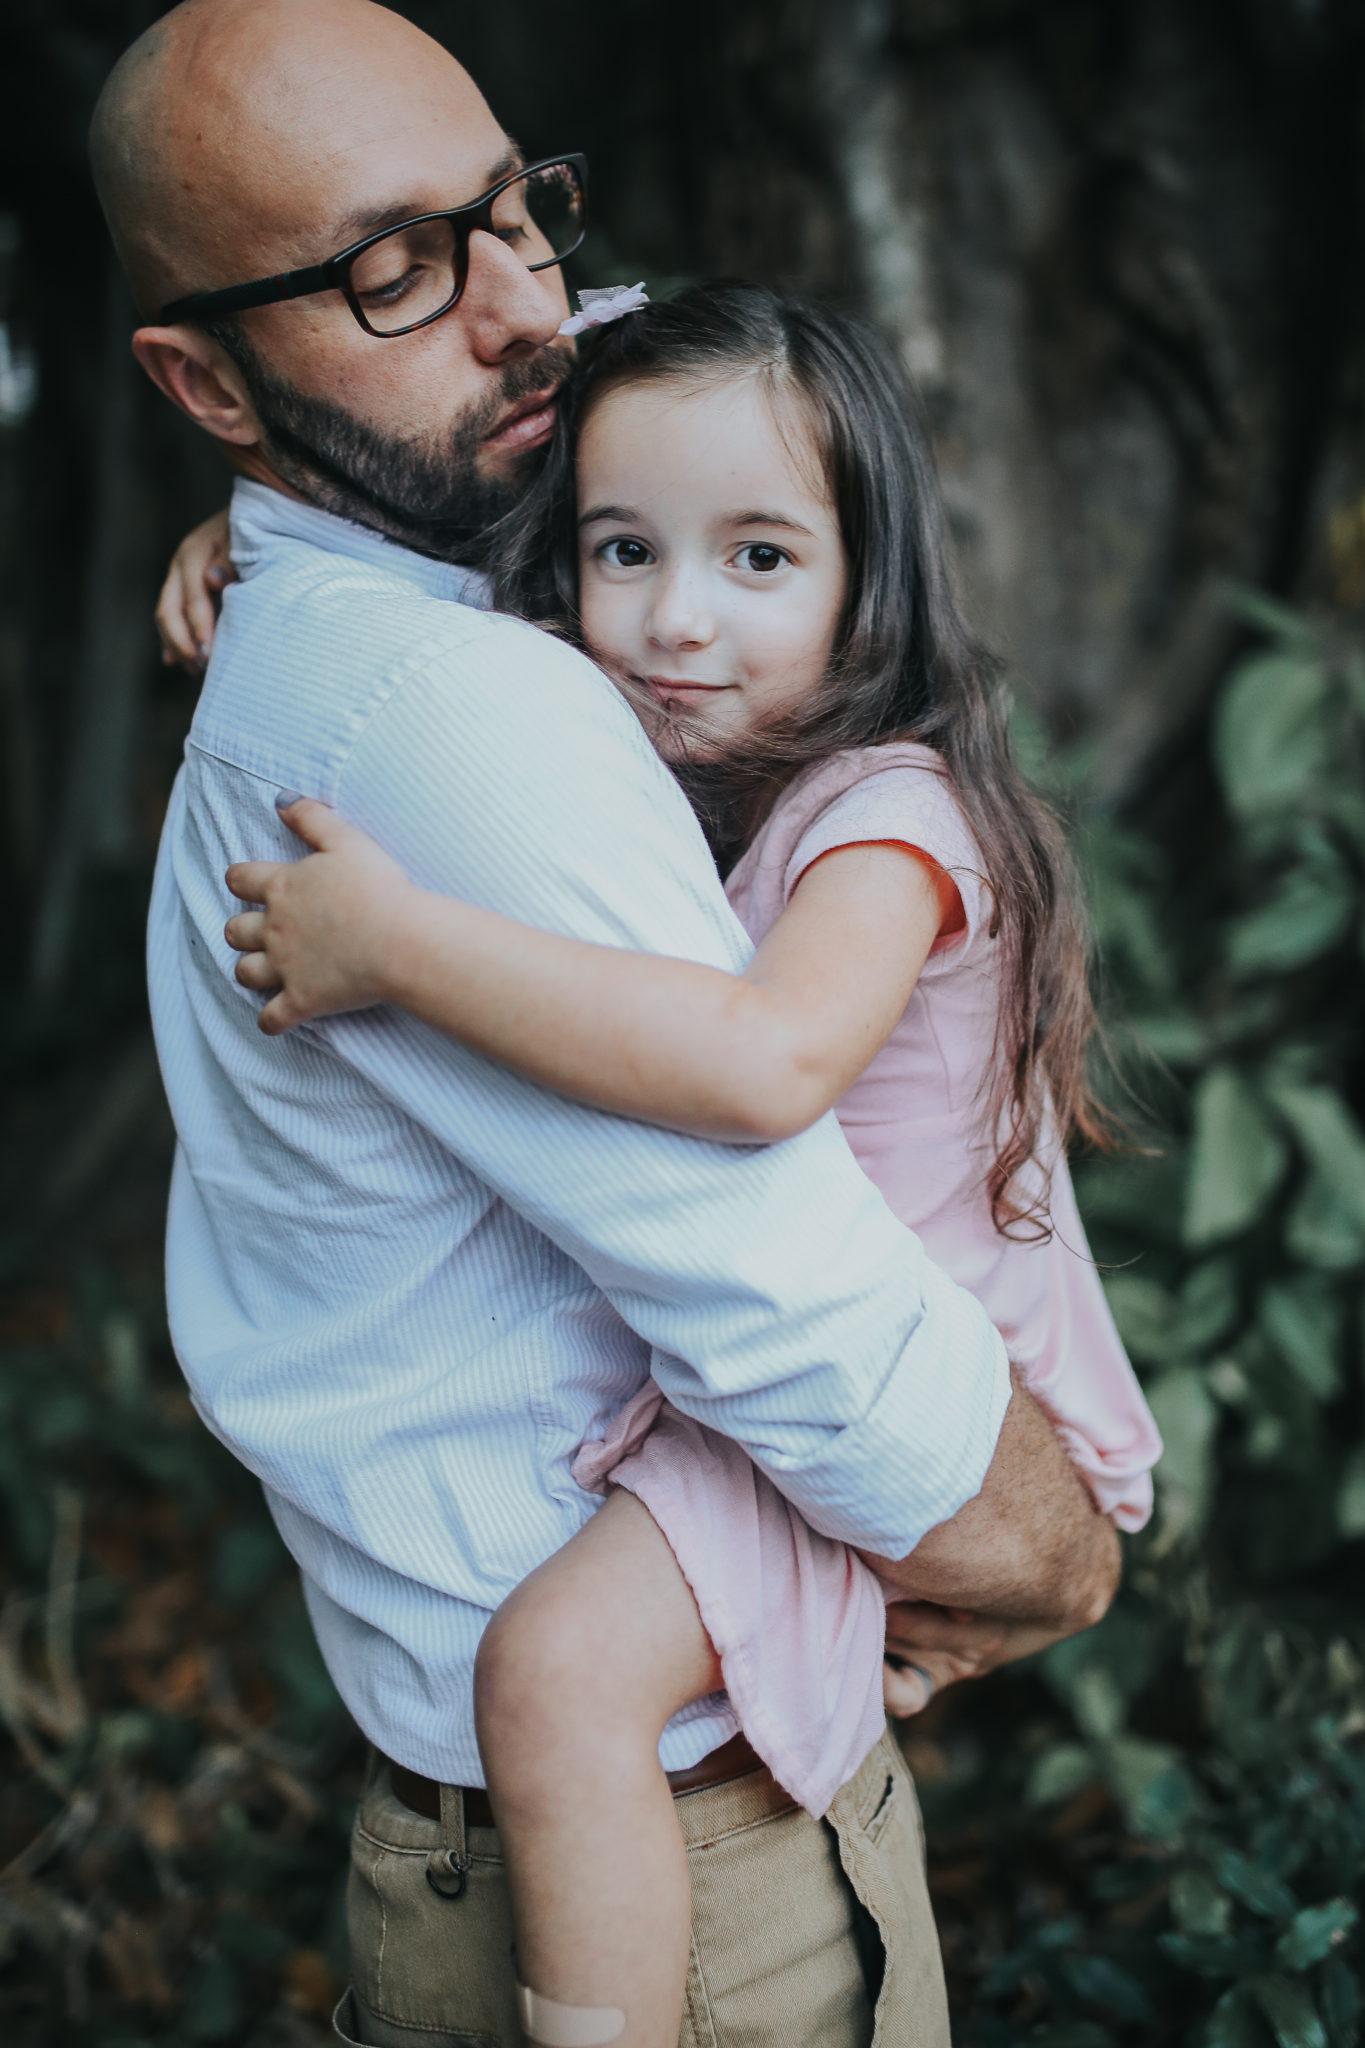 #familyphotos family pictures ideas, family pictures outfits, family pictures with baby, family pictures near me, fall family photos